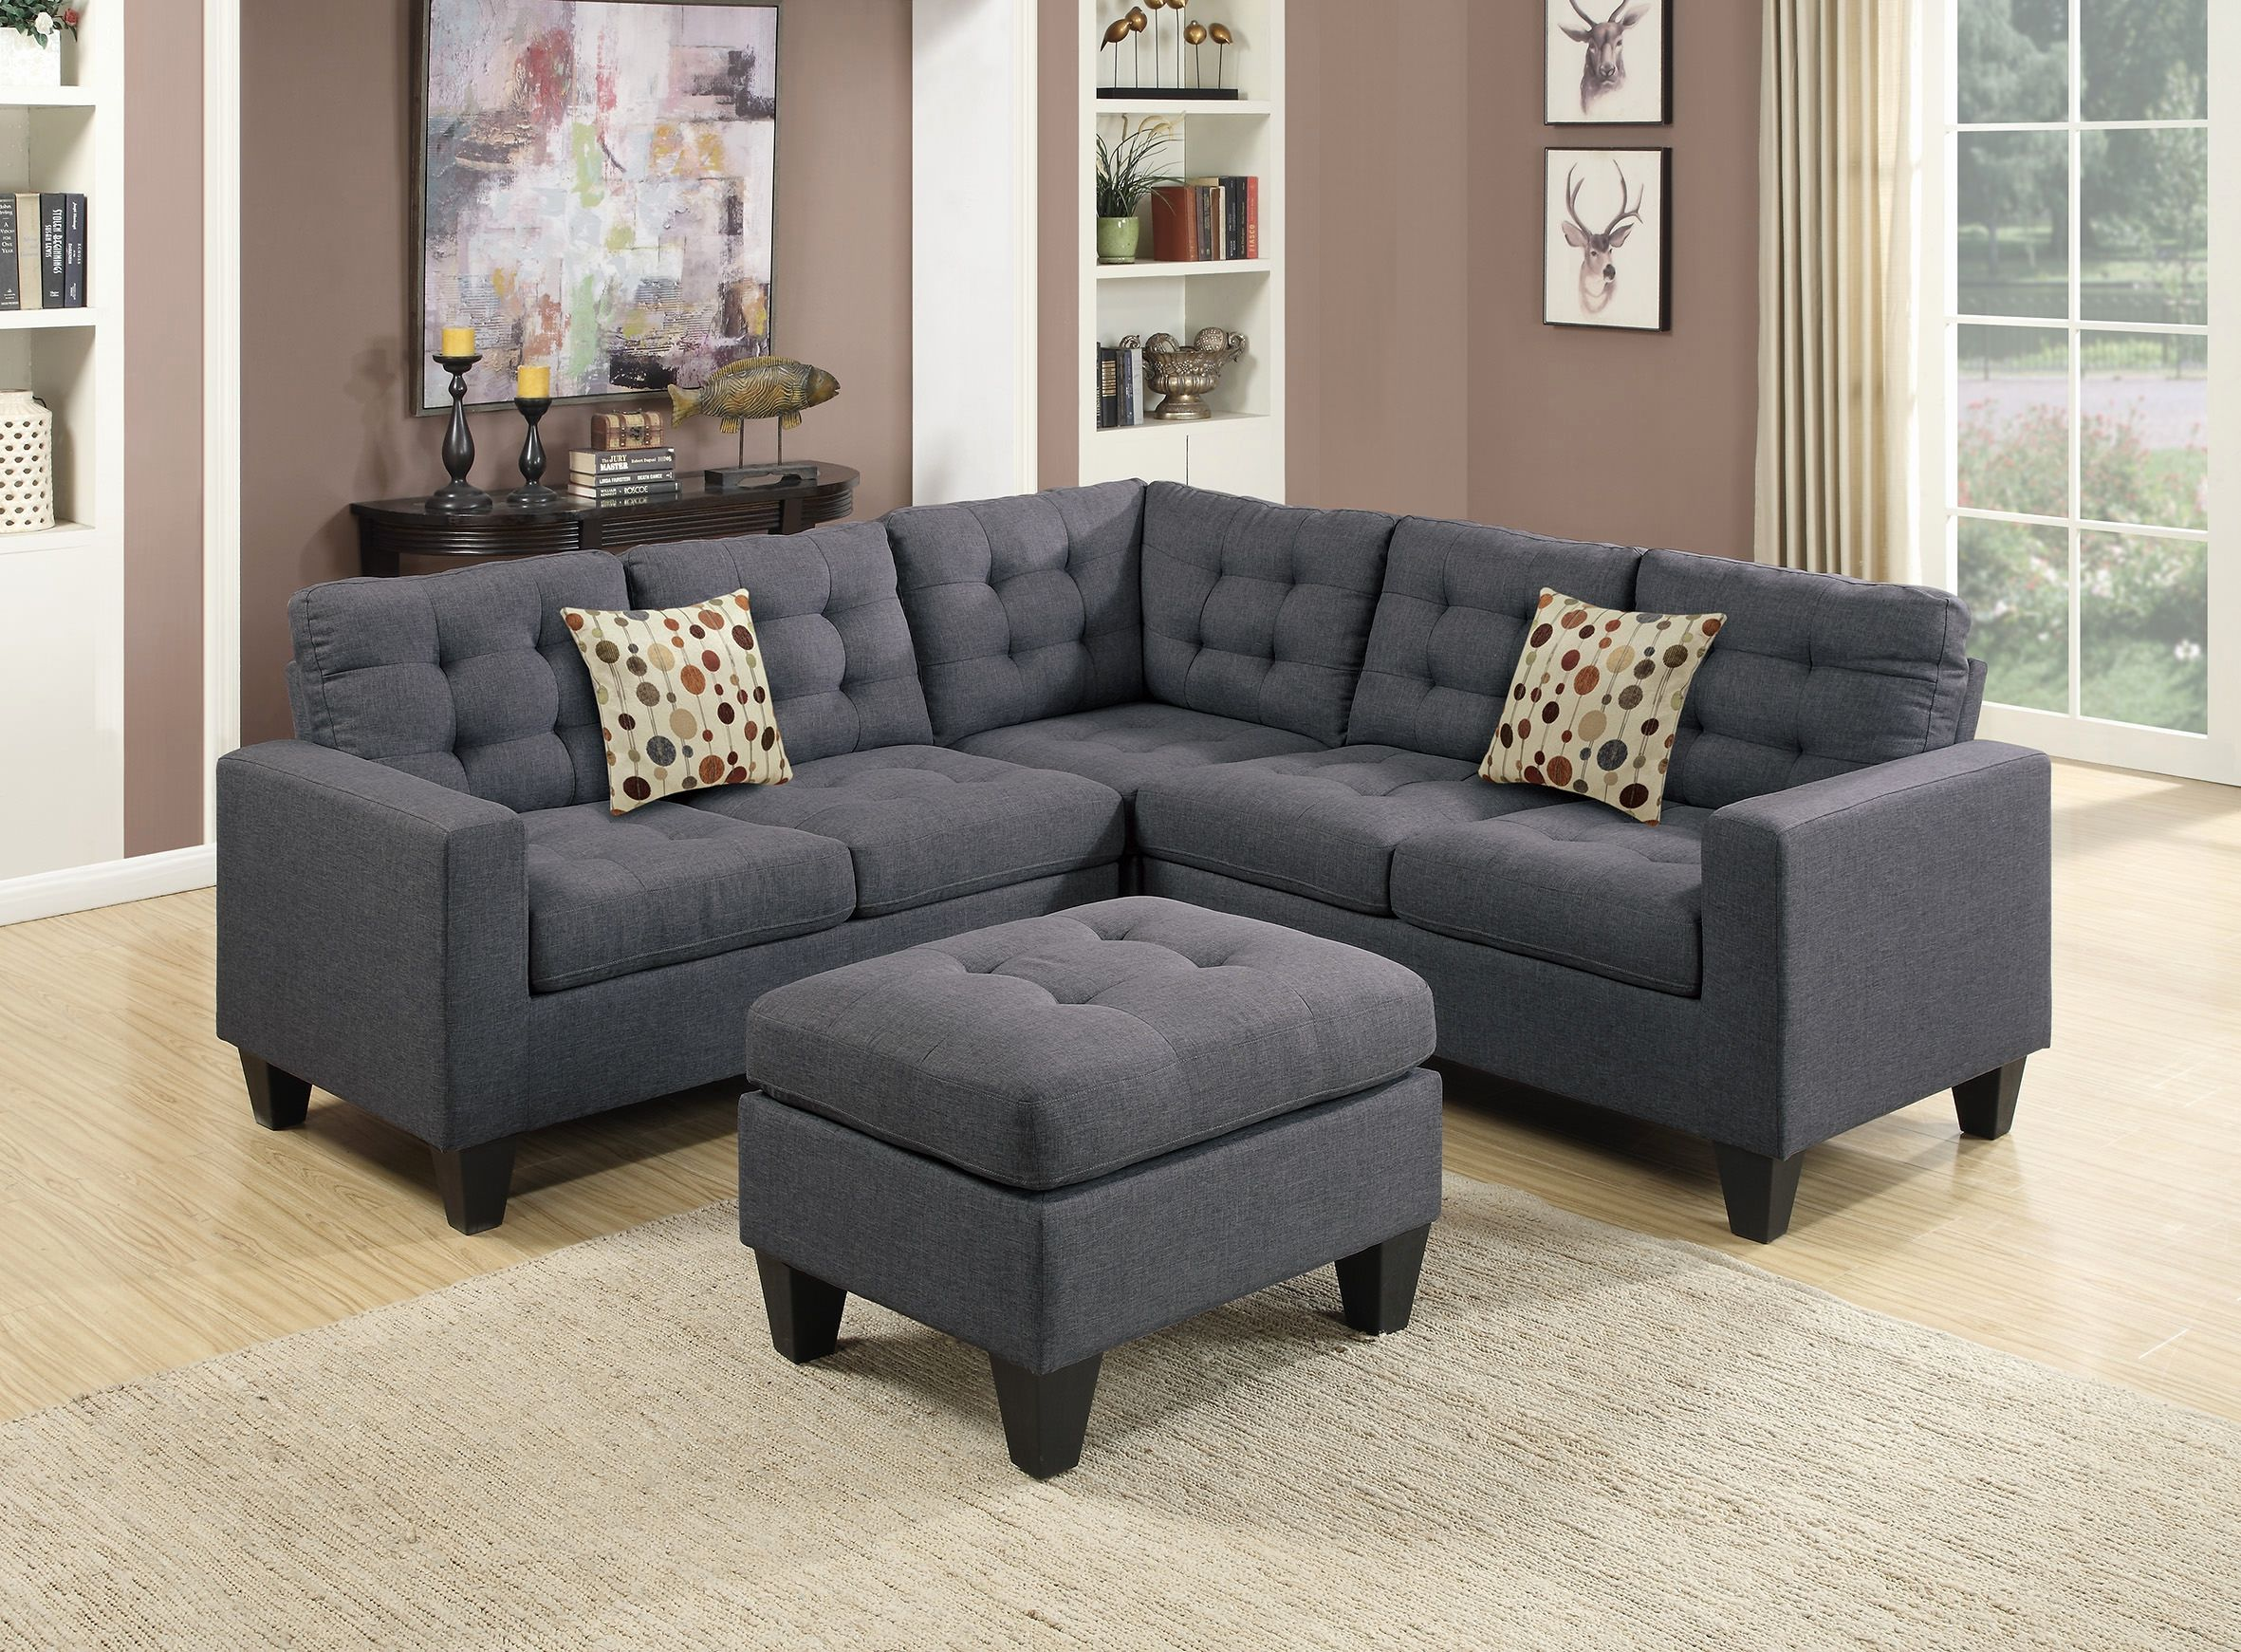 Inspirational Blue Microfiber Sectional Sofa Blue Microfiber Sectional Sofa Awesome Breathtaking Blue Sectional Sofa